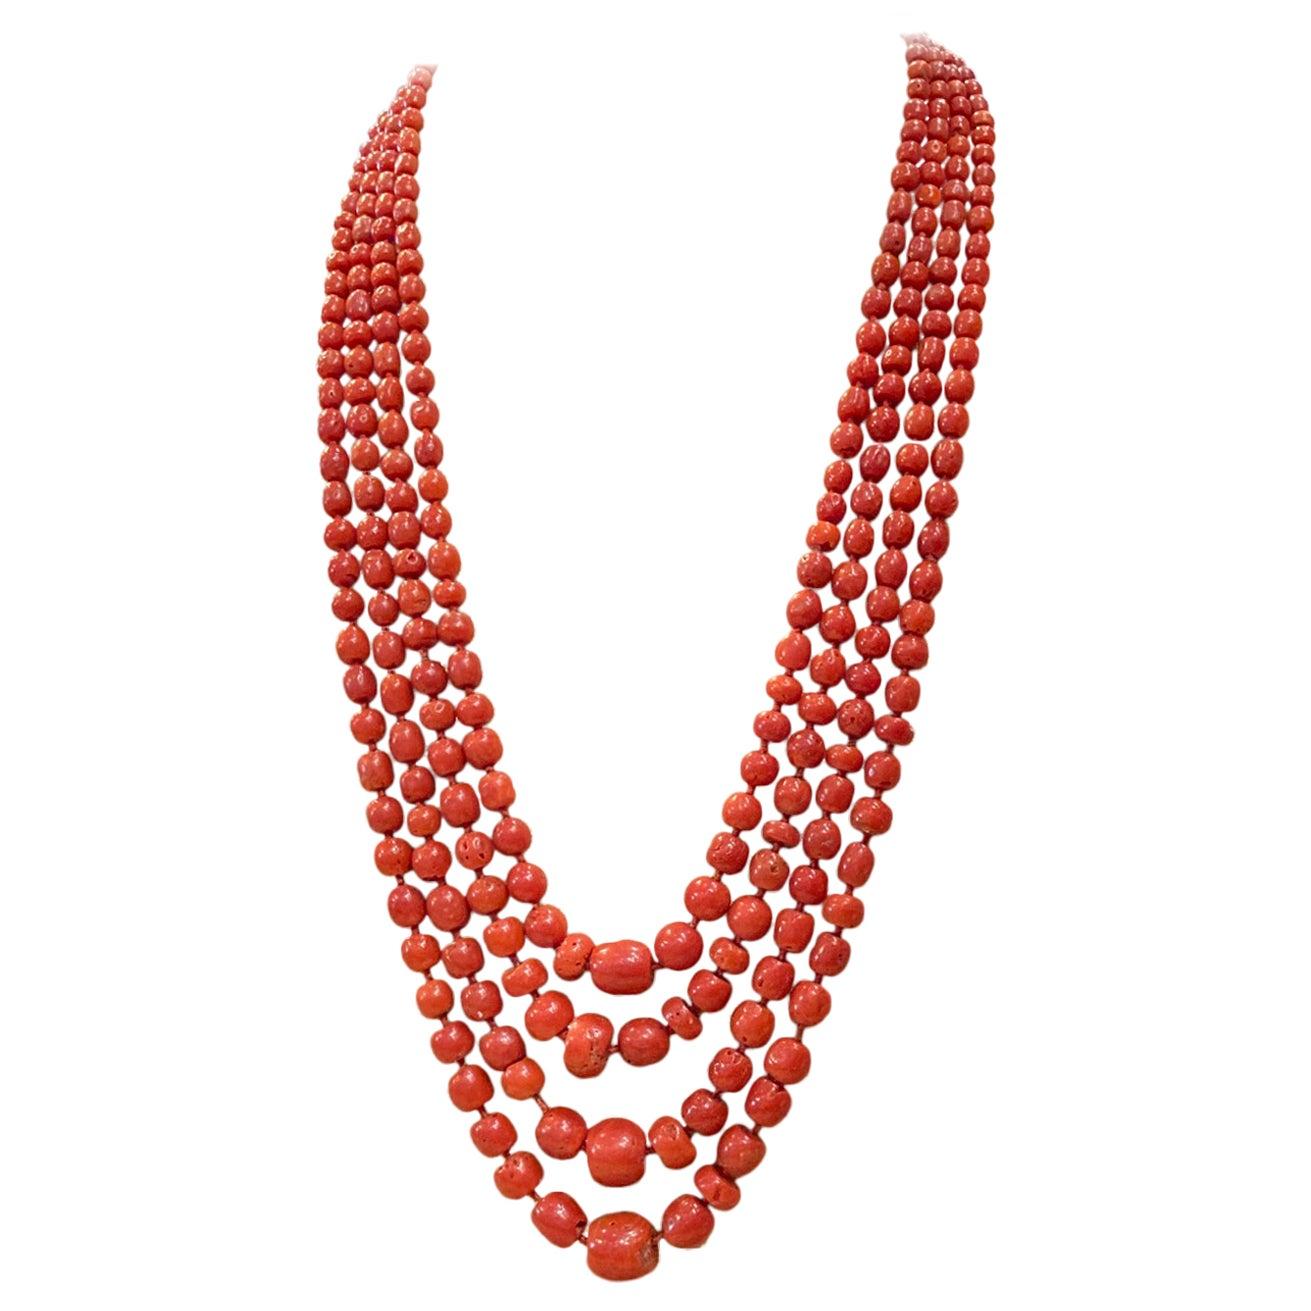 Antique Coral Bead Multi-Strand Necklace